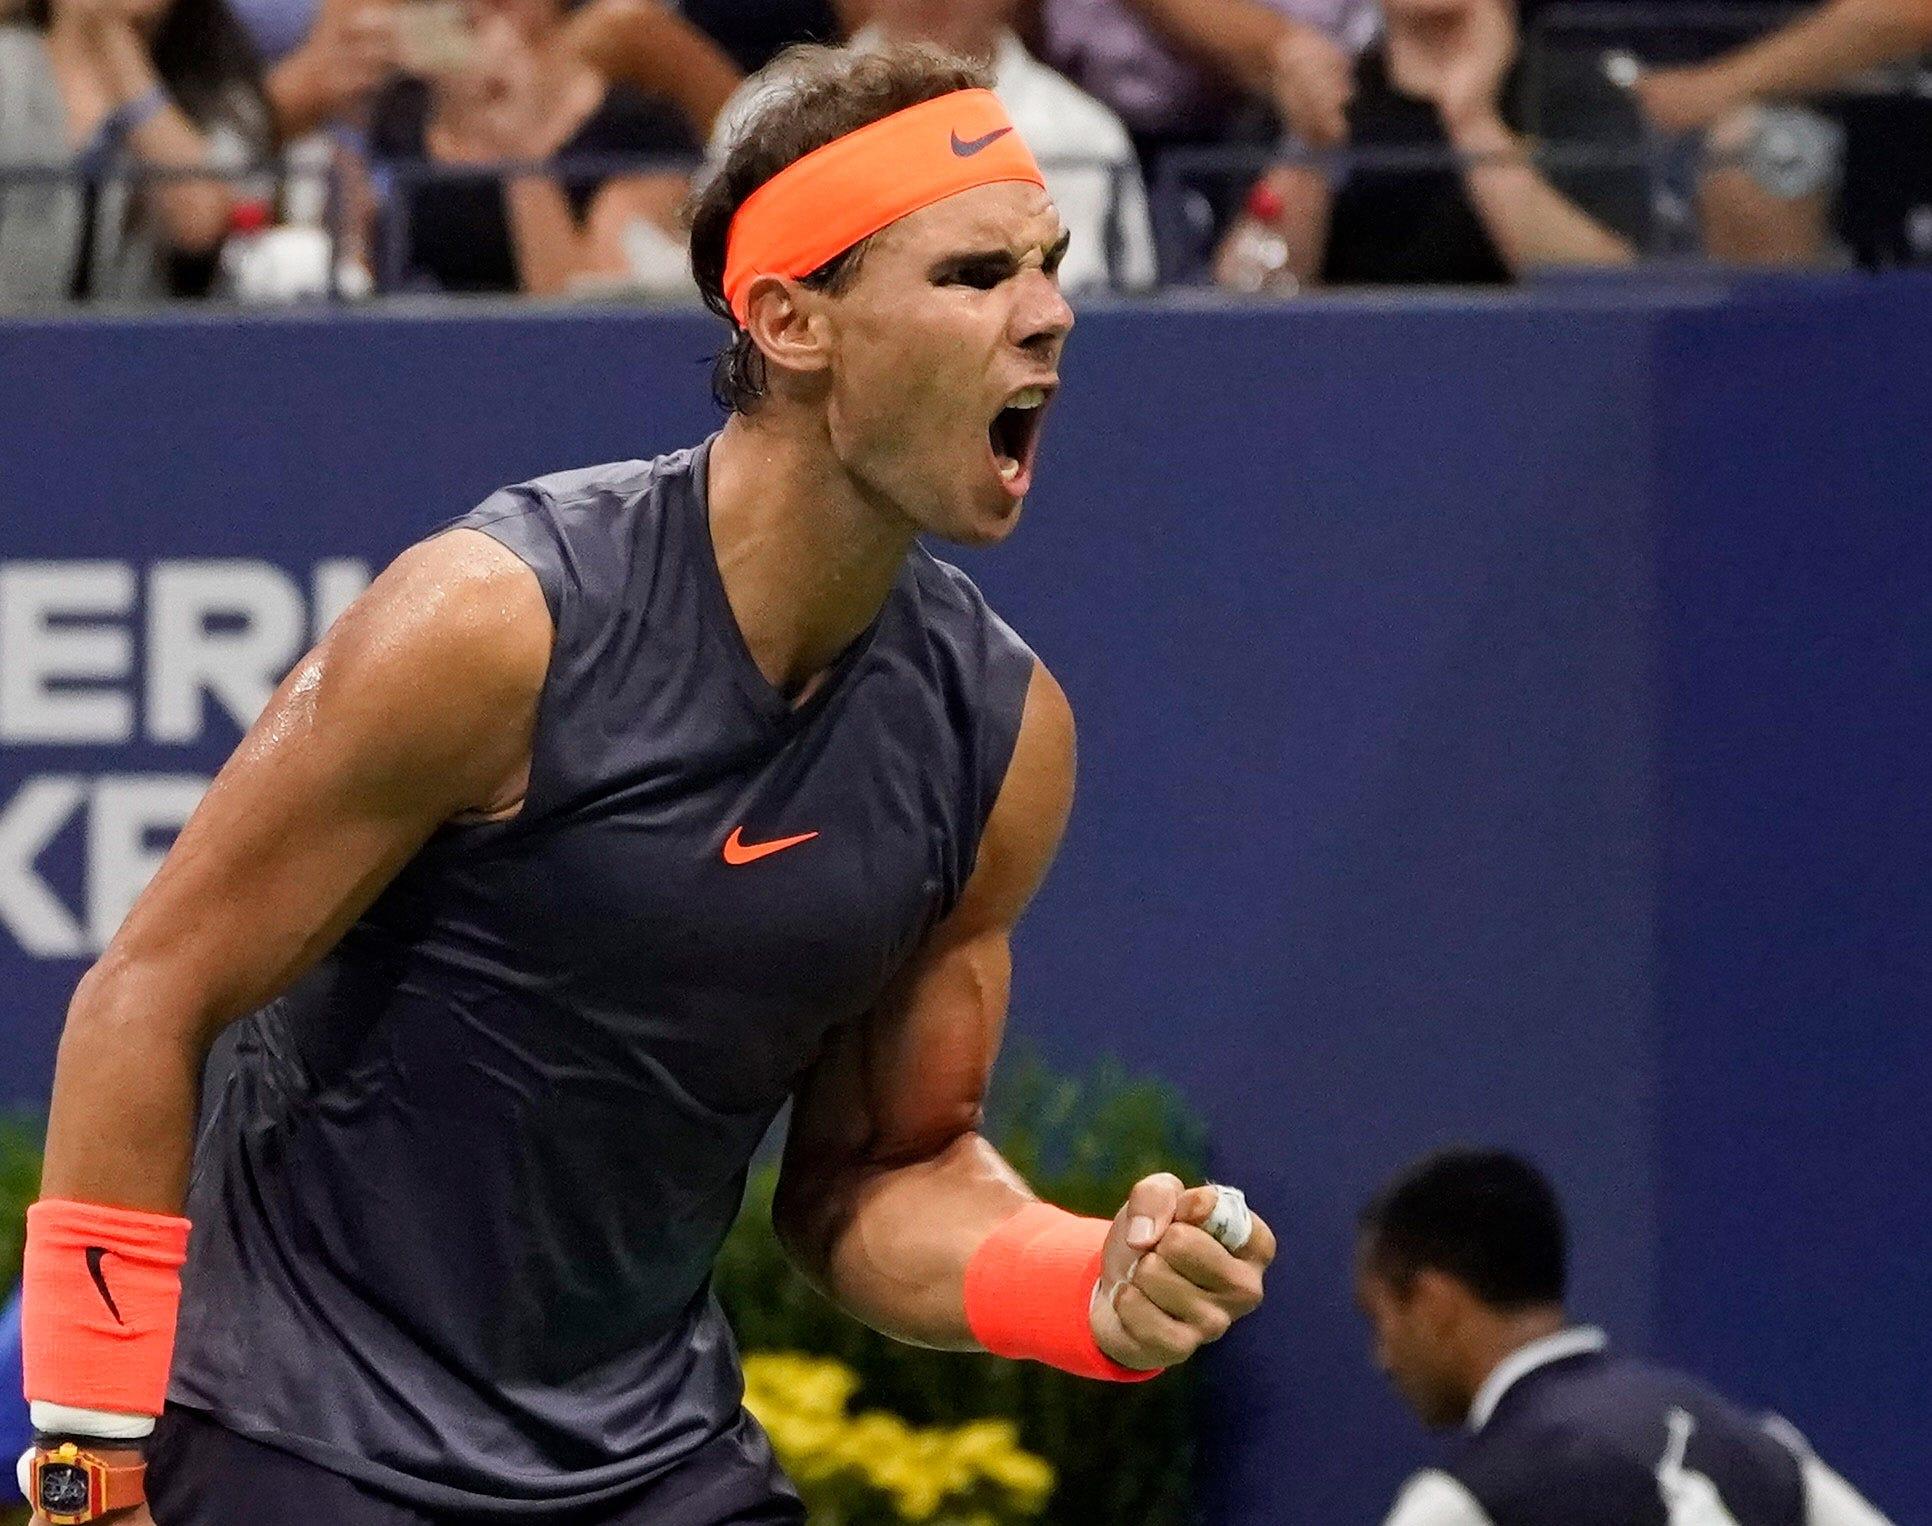 Rafael Nadal survives Dominic Thiem in 4-hour, 49-minute marathon at US Open